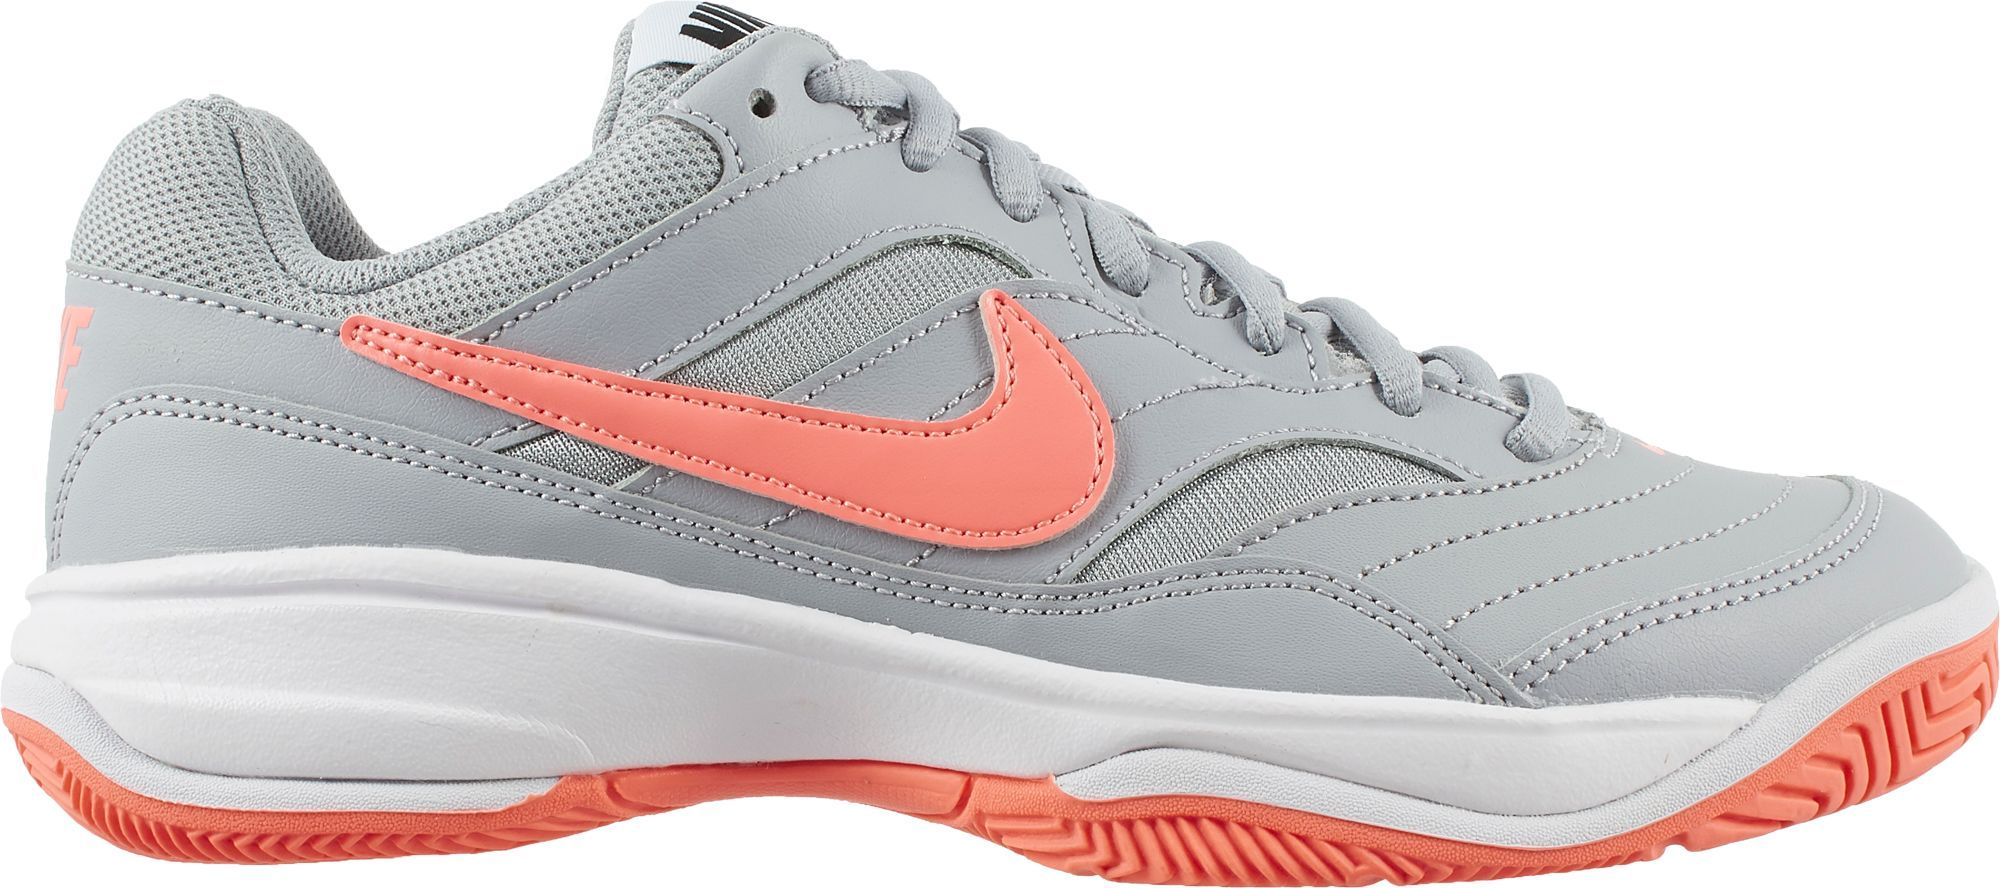 c8ae540e Nike Women's Court Lite Tennis Shoes | Products | Sneakers nike ...